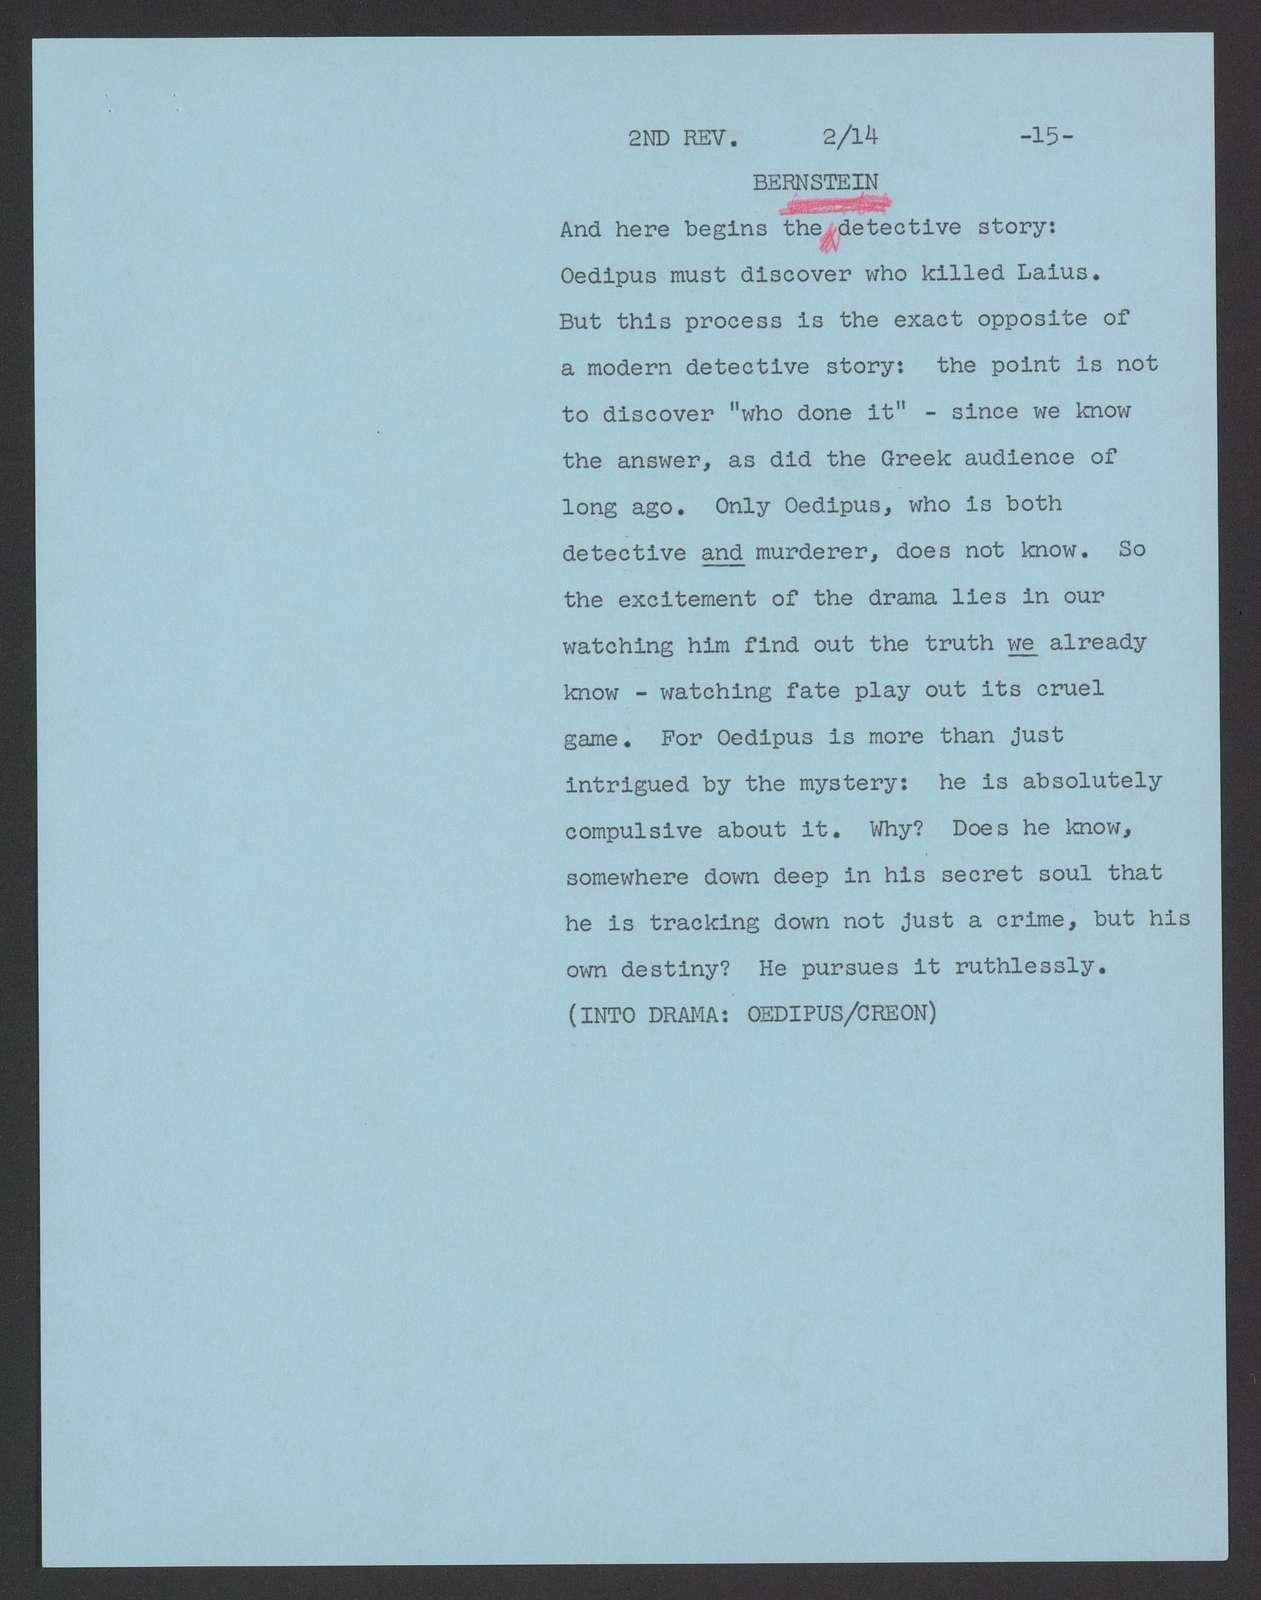 Drama into opera: Oedipus Rex TV script, Ford Presents, 1961 Feb. 26